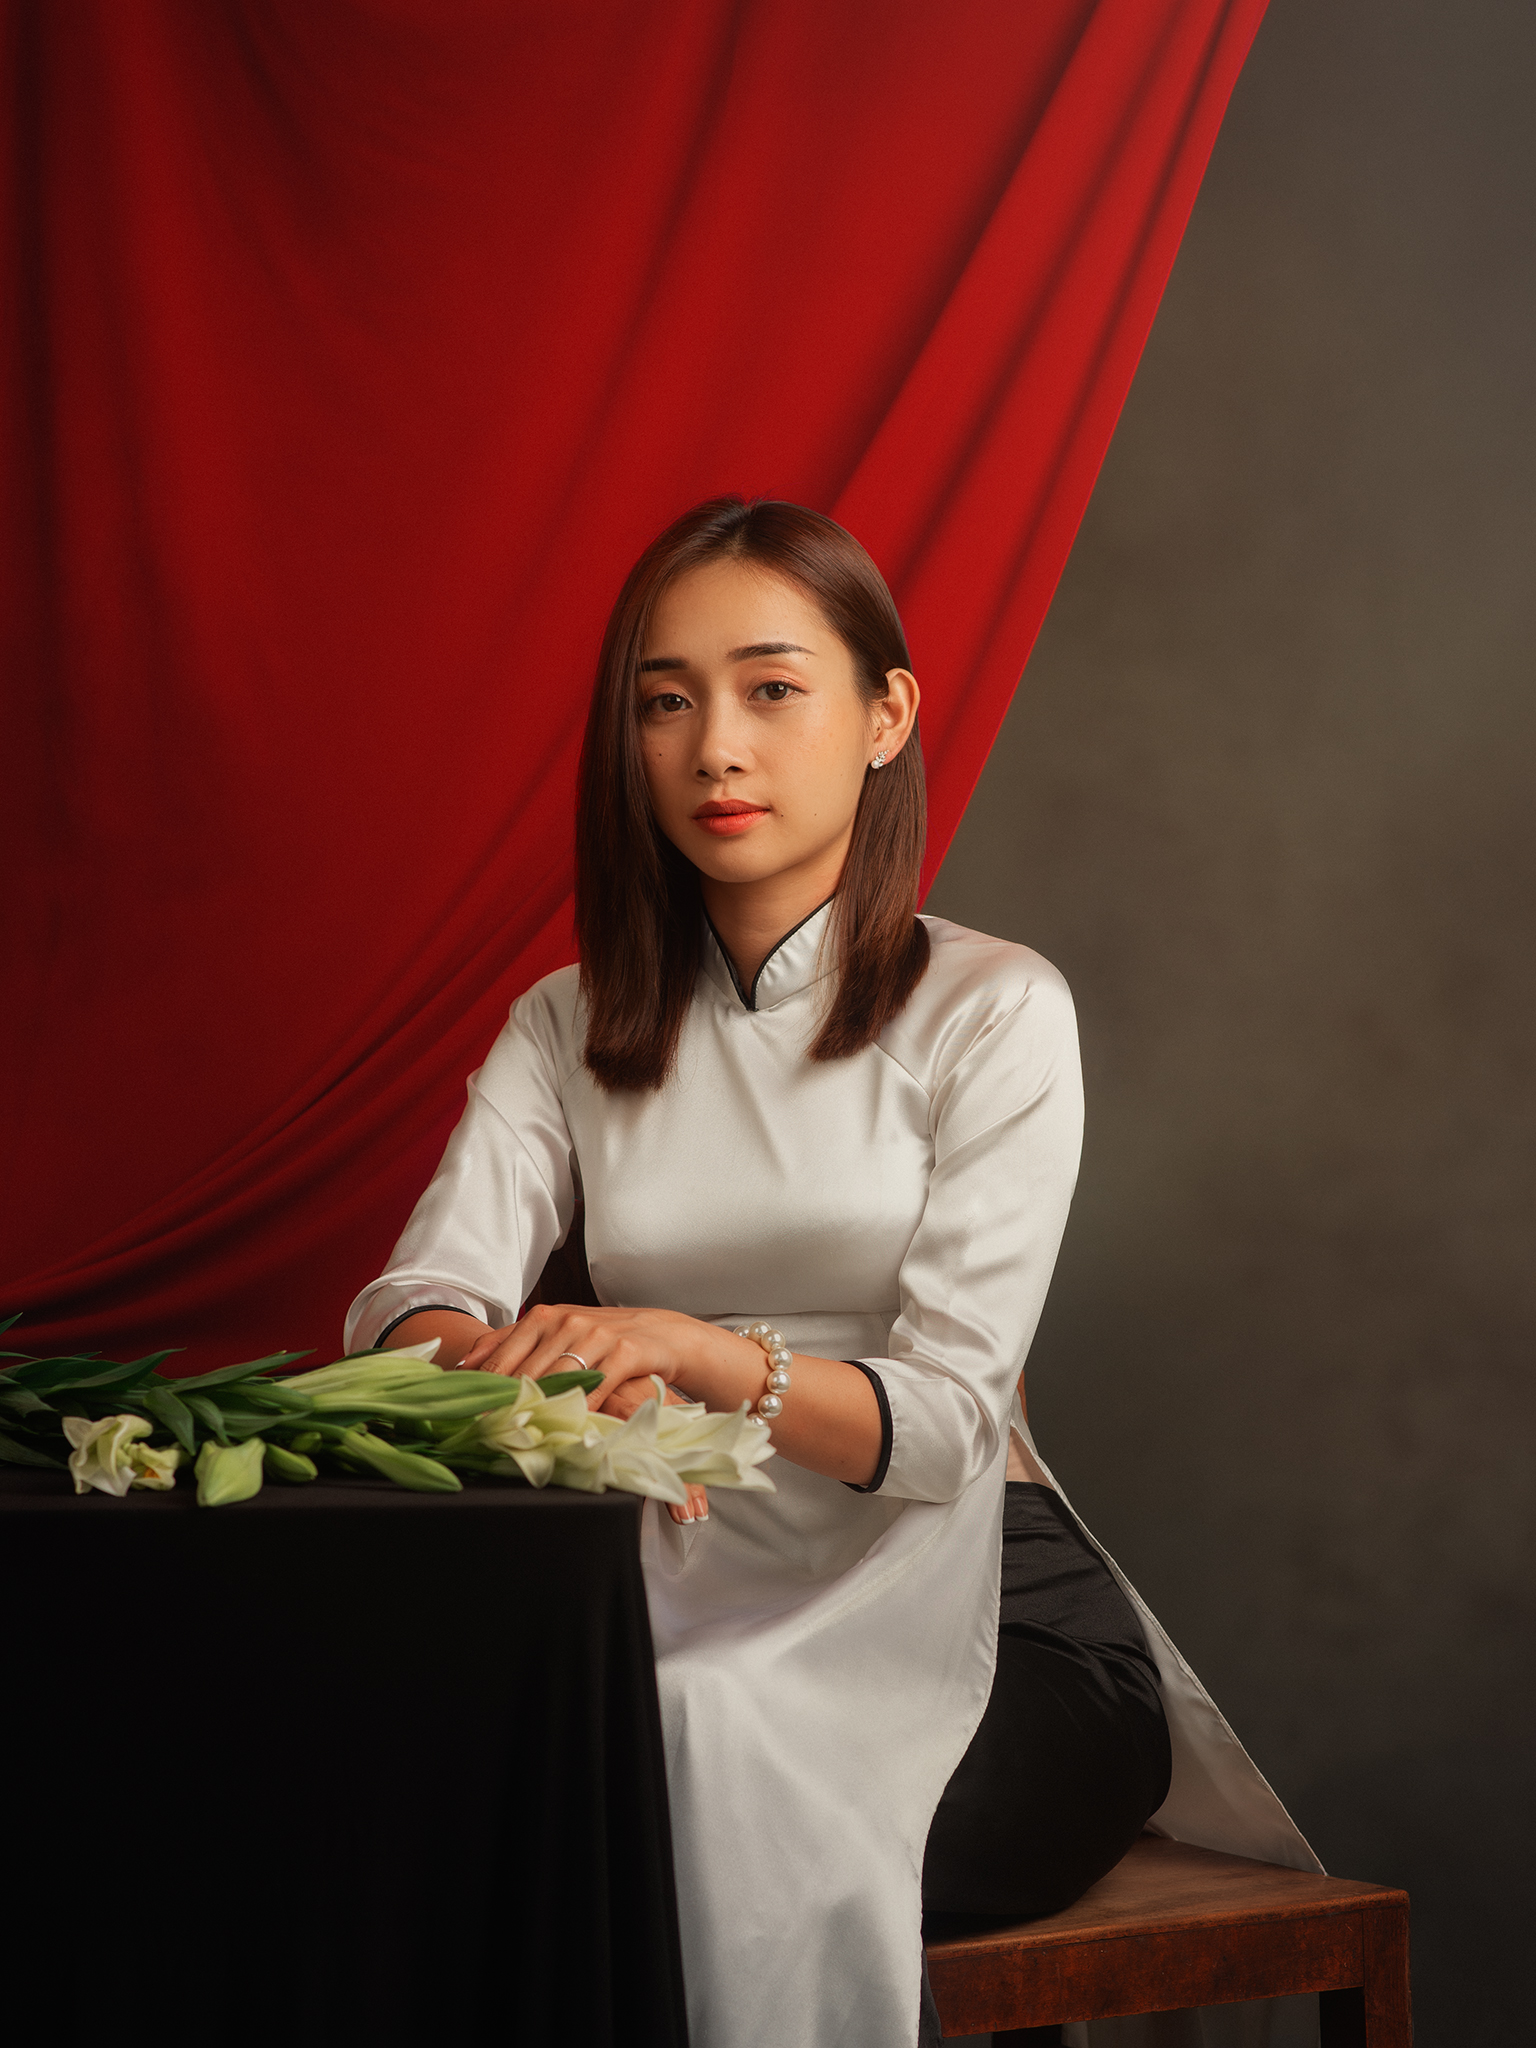 portrait, woman, female, beauty, face, vietnamese, asian, girl, studio, traditional dress, dress, staged, white, lilly, flower, Hoang Viet Nguyen